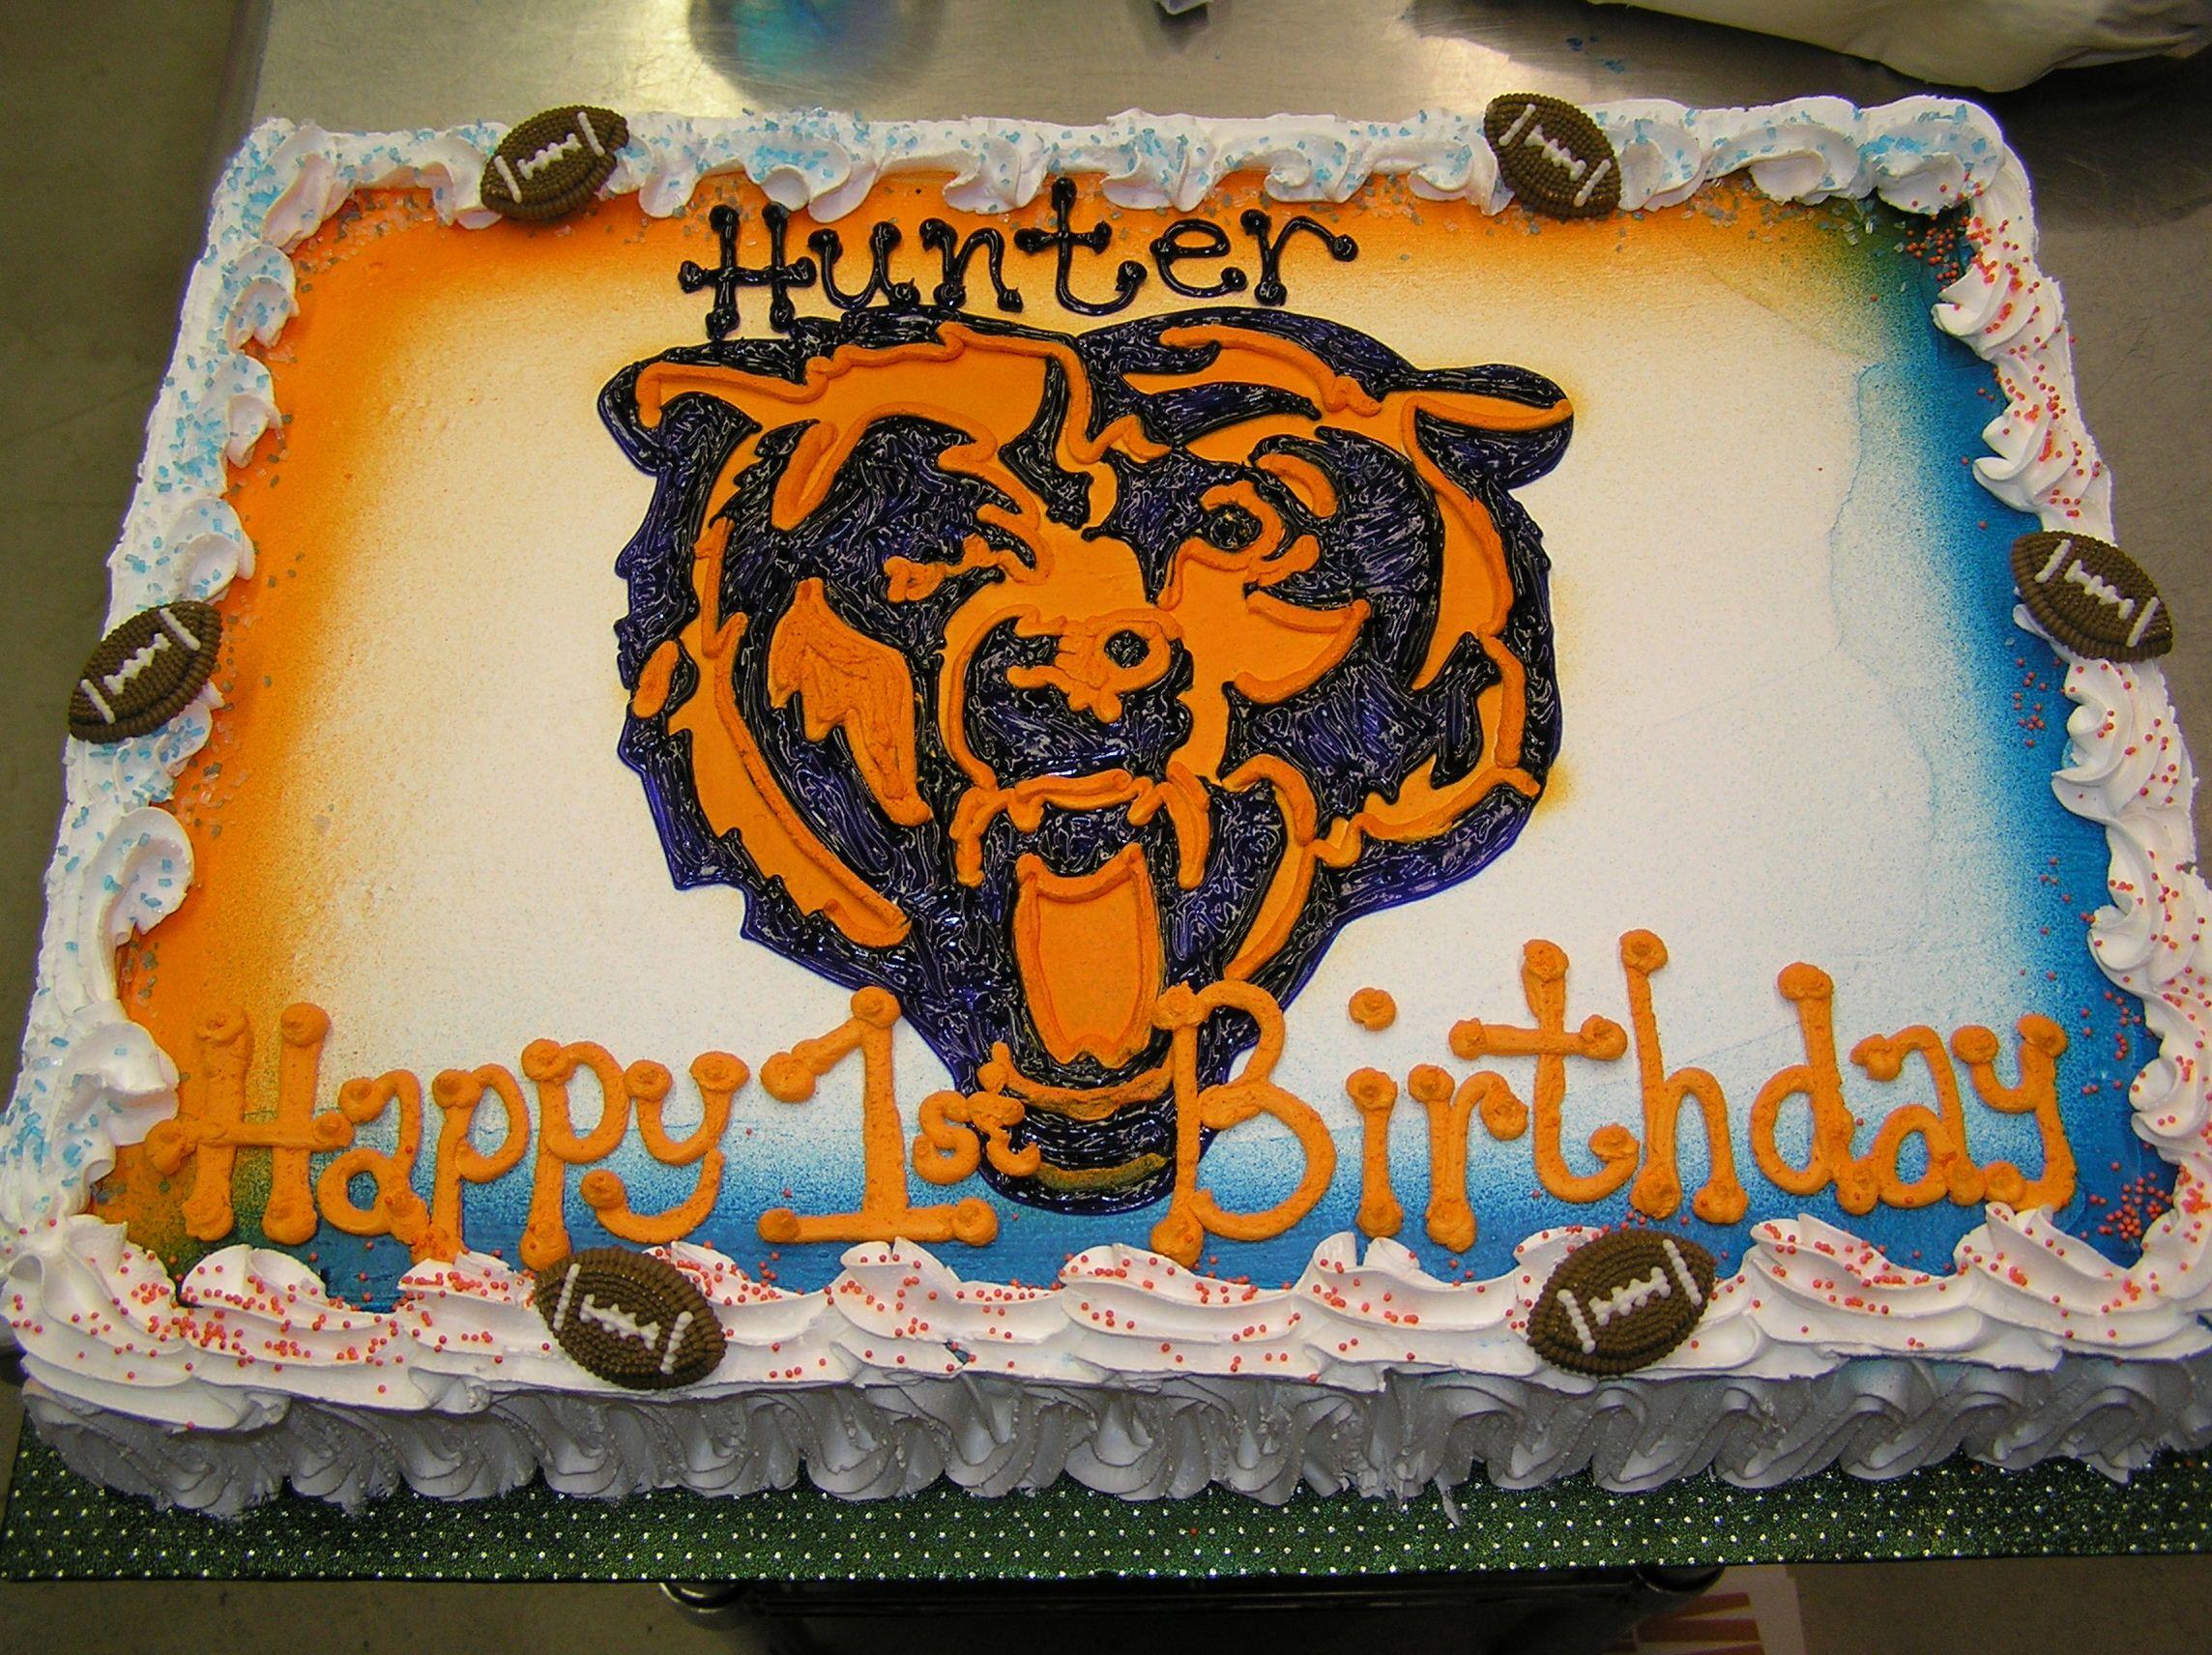 Marvelous Chicago Bears First Birthday Cake First Birthday Cakes Bithday Funny Birthday Cards Online Kookostrdamsfinfo